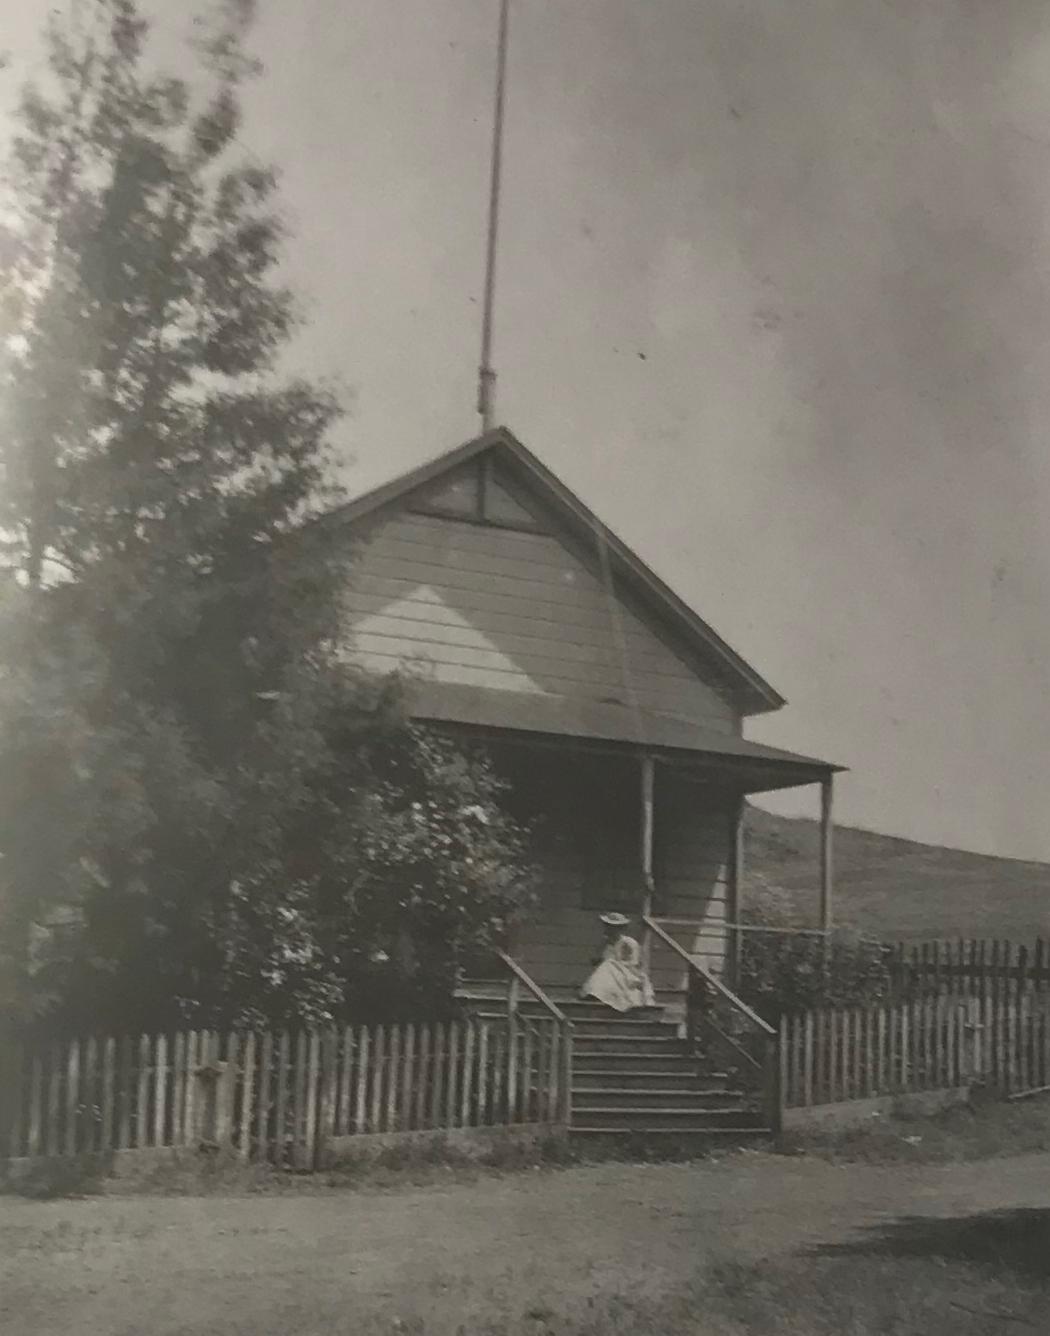 Tocaloma Schoolhouse